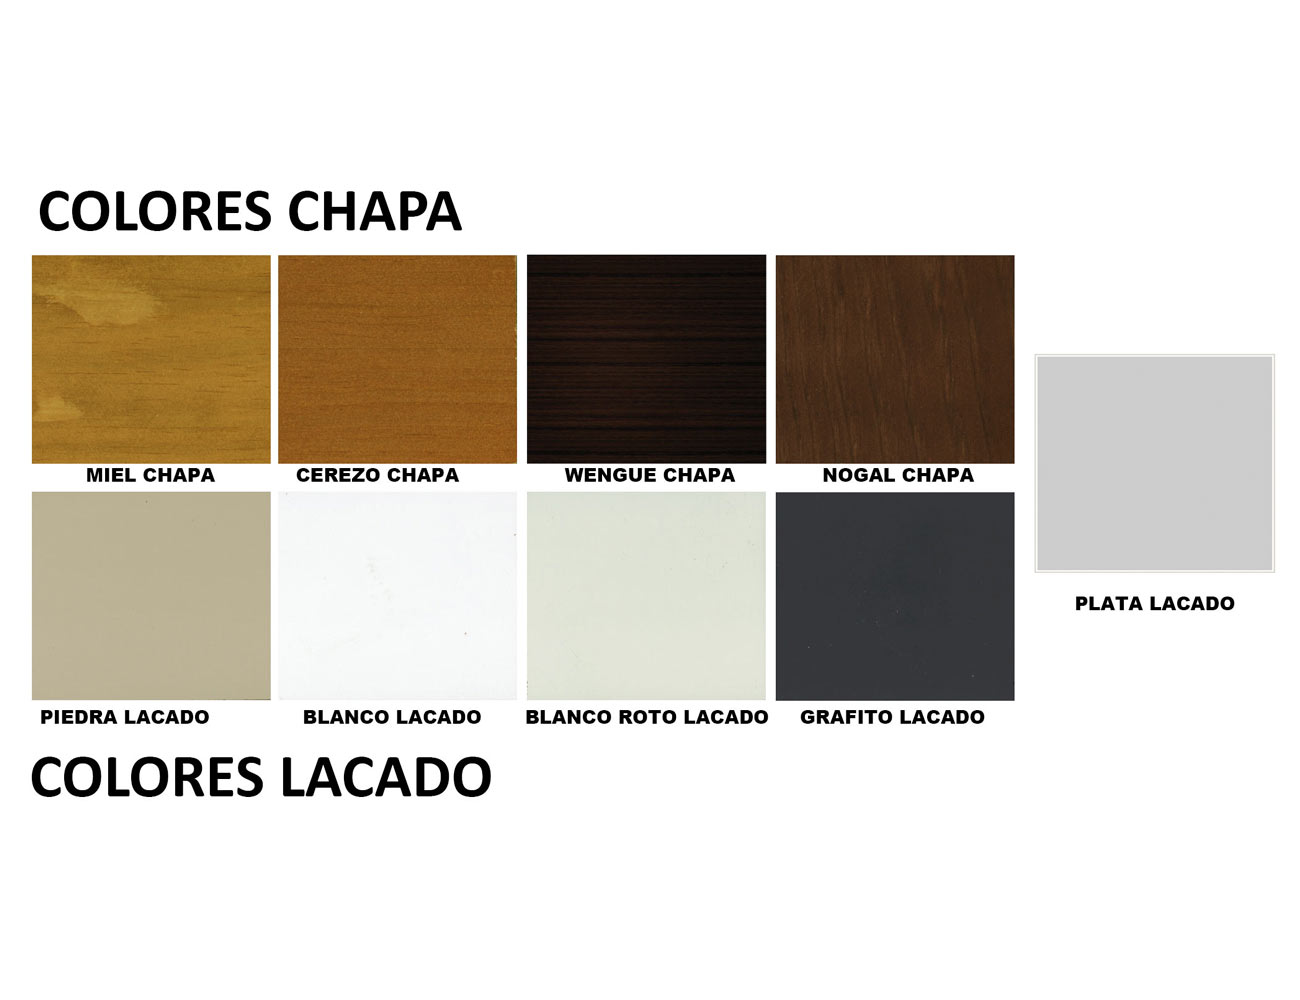 Colores213